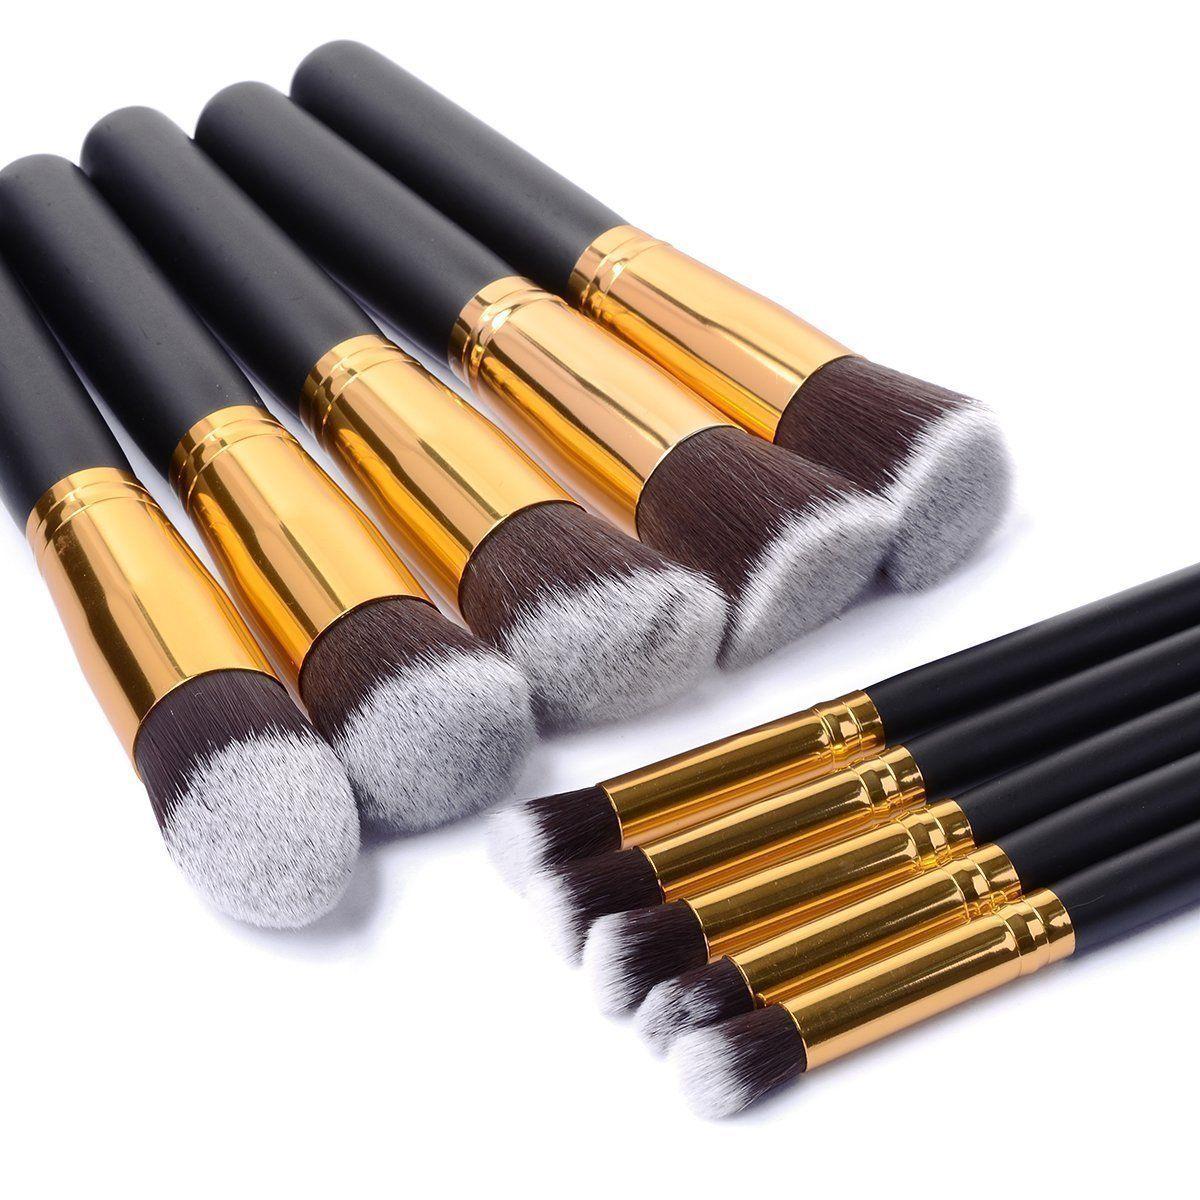 High Quality Makeup Brushes Beauty Foundation Blush Eyeshadow ...